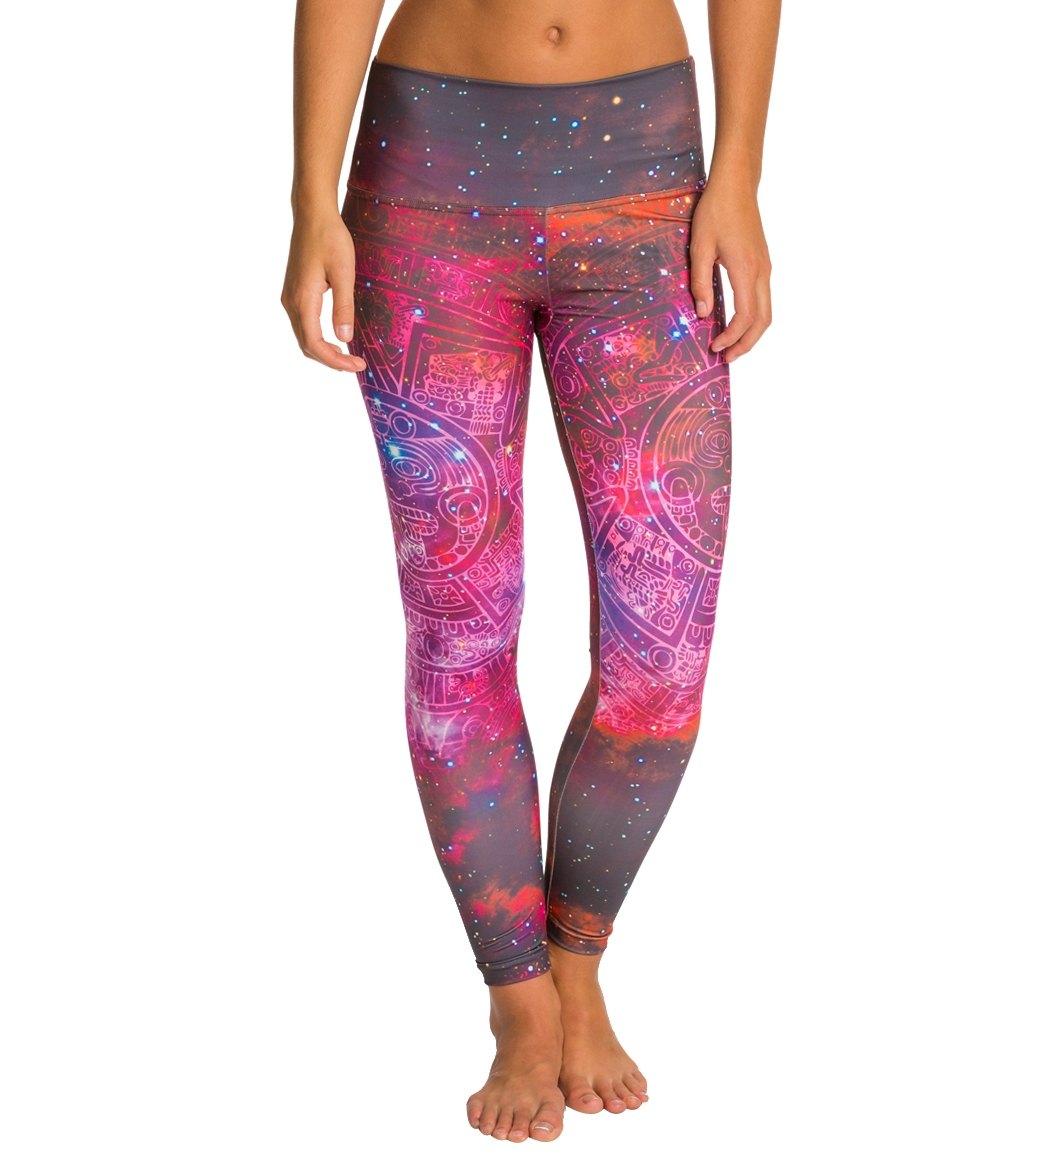 22d0d799defaf Om Shanti Clothing Pink Galaxy Aztec Cluster Performance Legging at ...